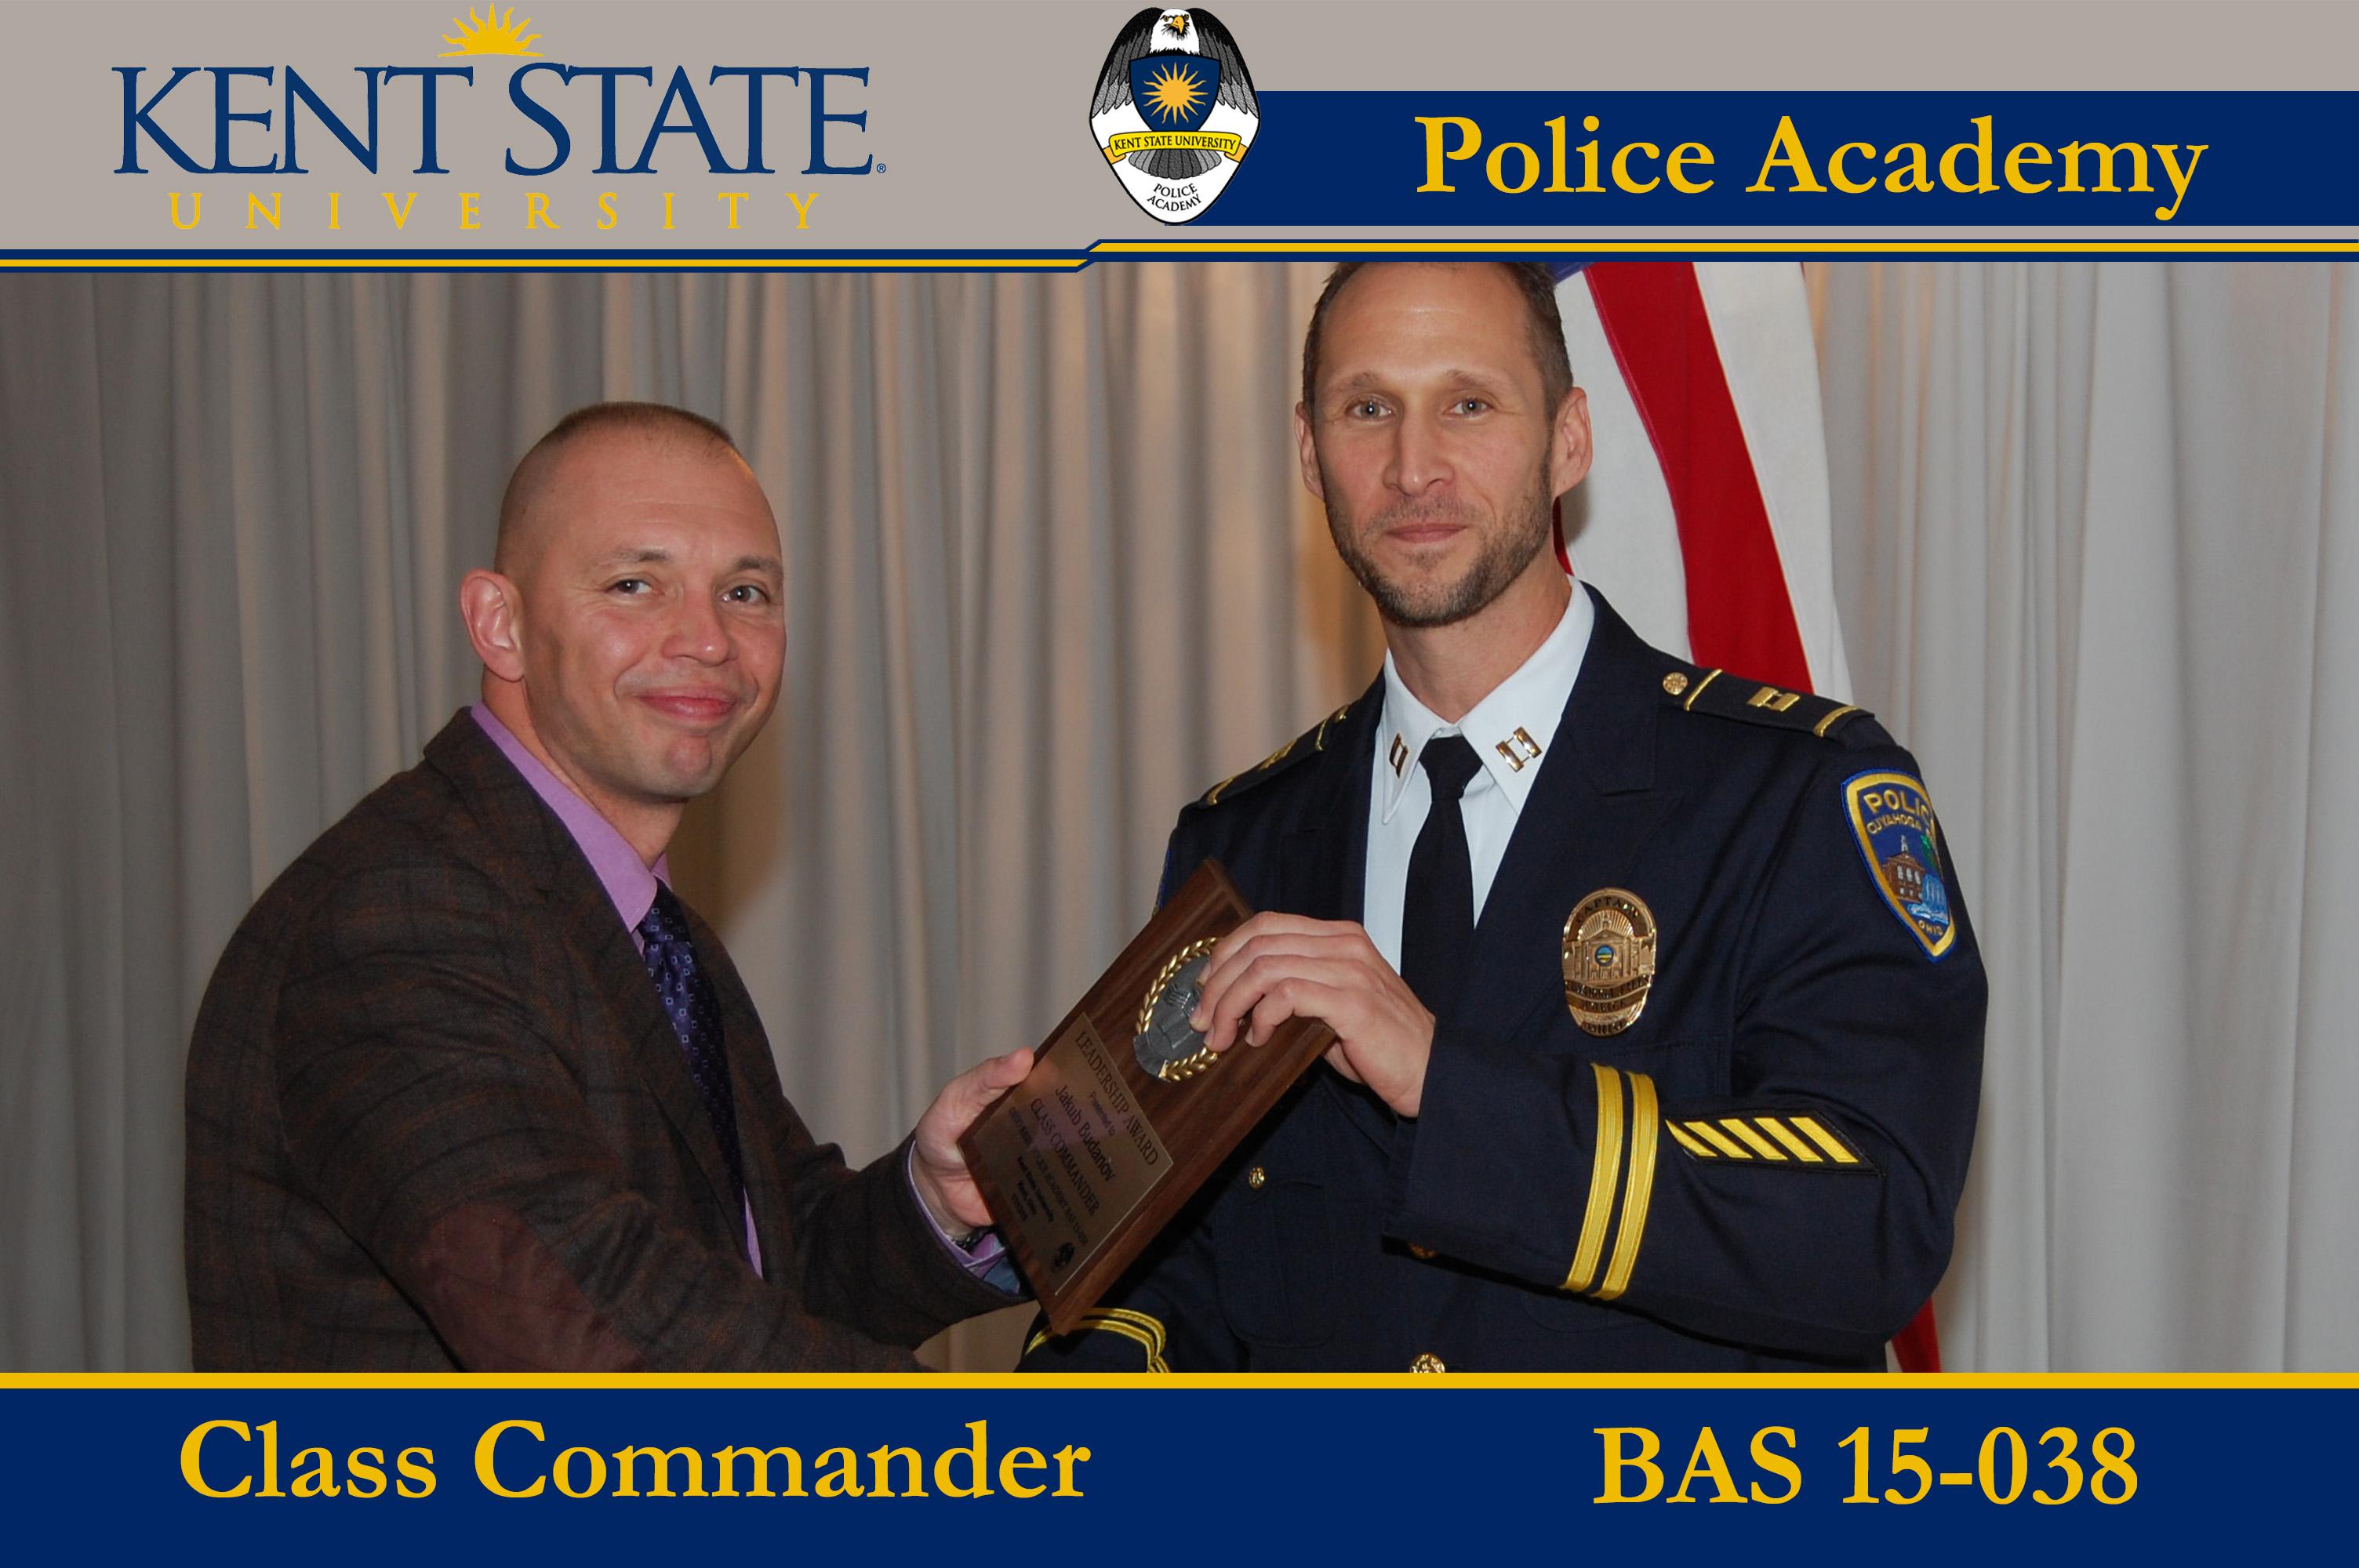 Cadet Pictured Receiving Class Commander Award BAS 15-038